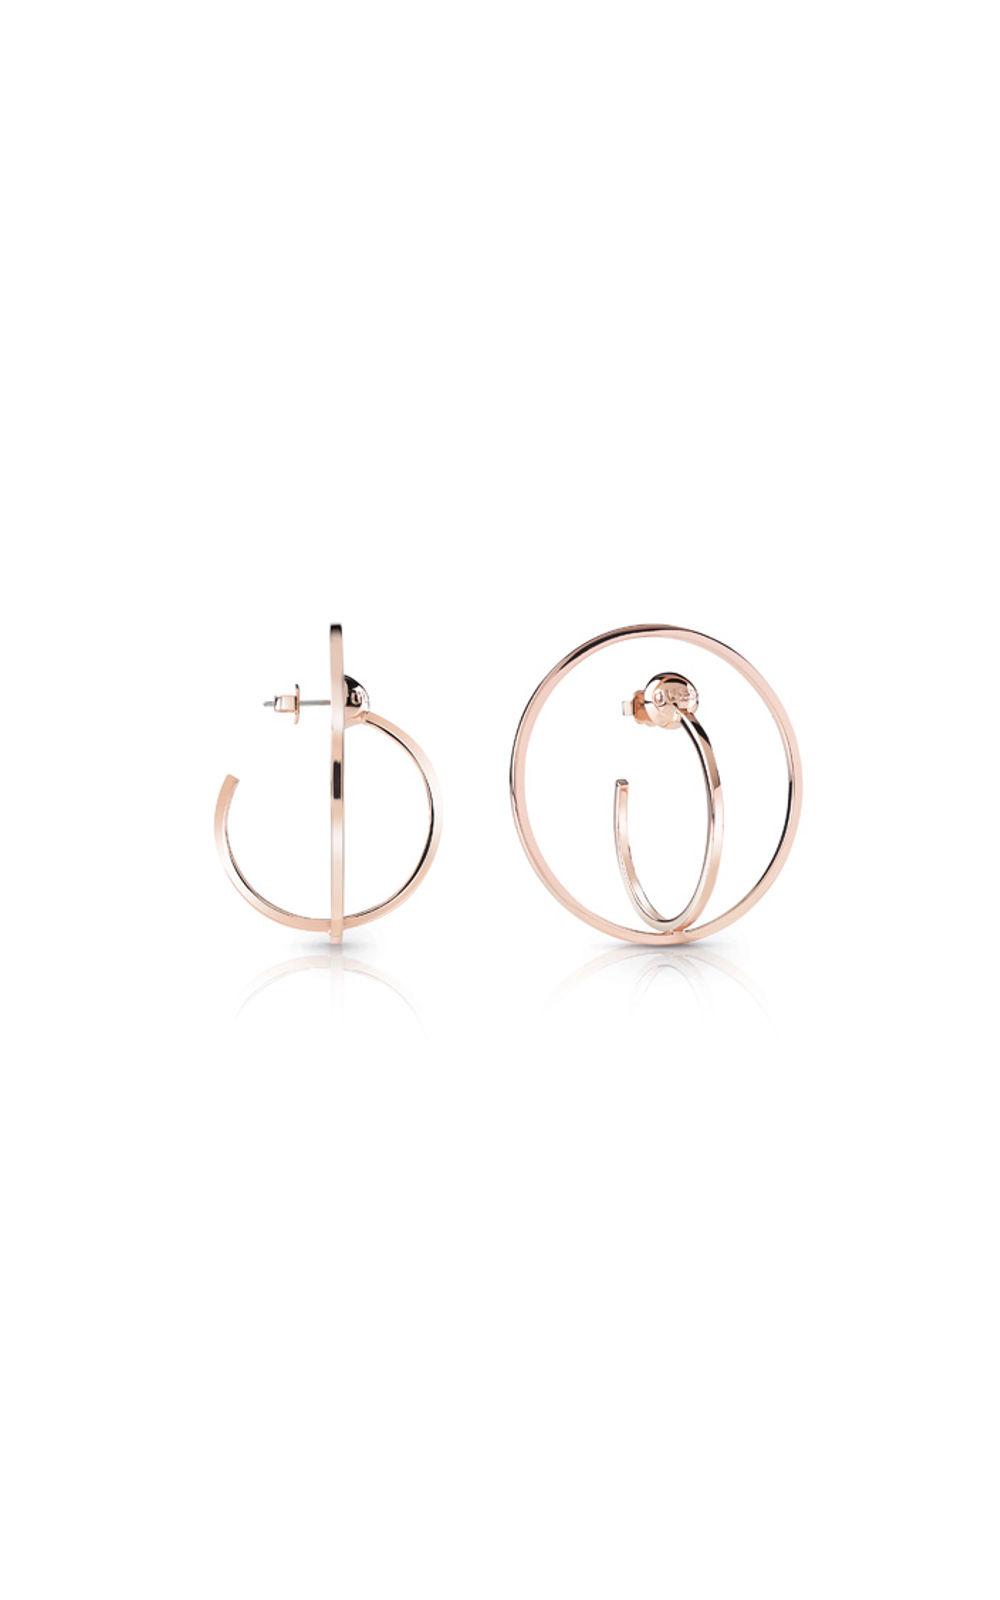 GUESS FAUX UBE85041 Ροζ Χρυσά Σκουλαρίκια Διπλοί Κρίκοι